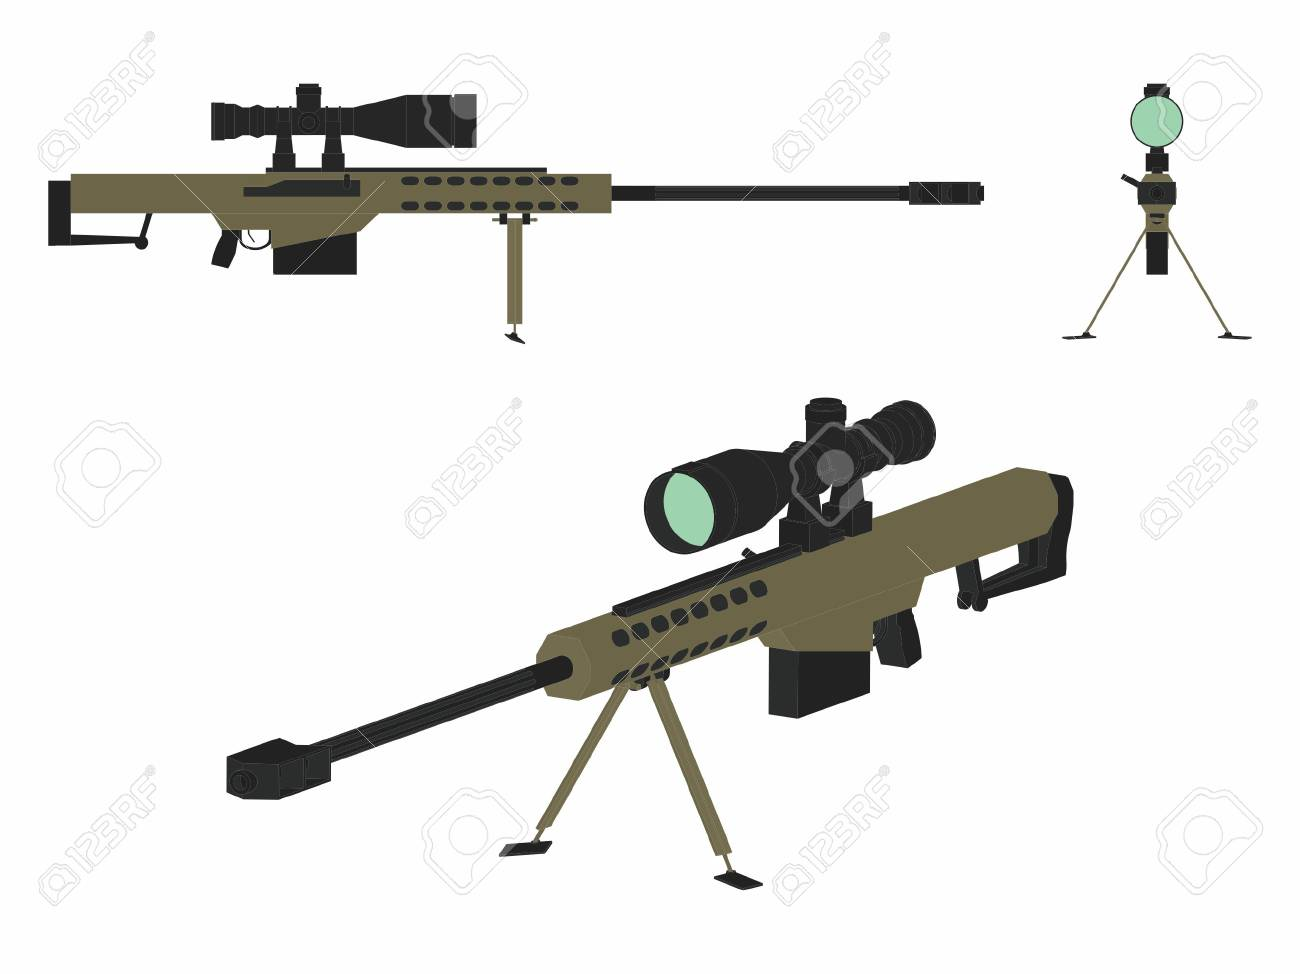 Sniper gun colored - 105329392